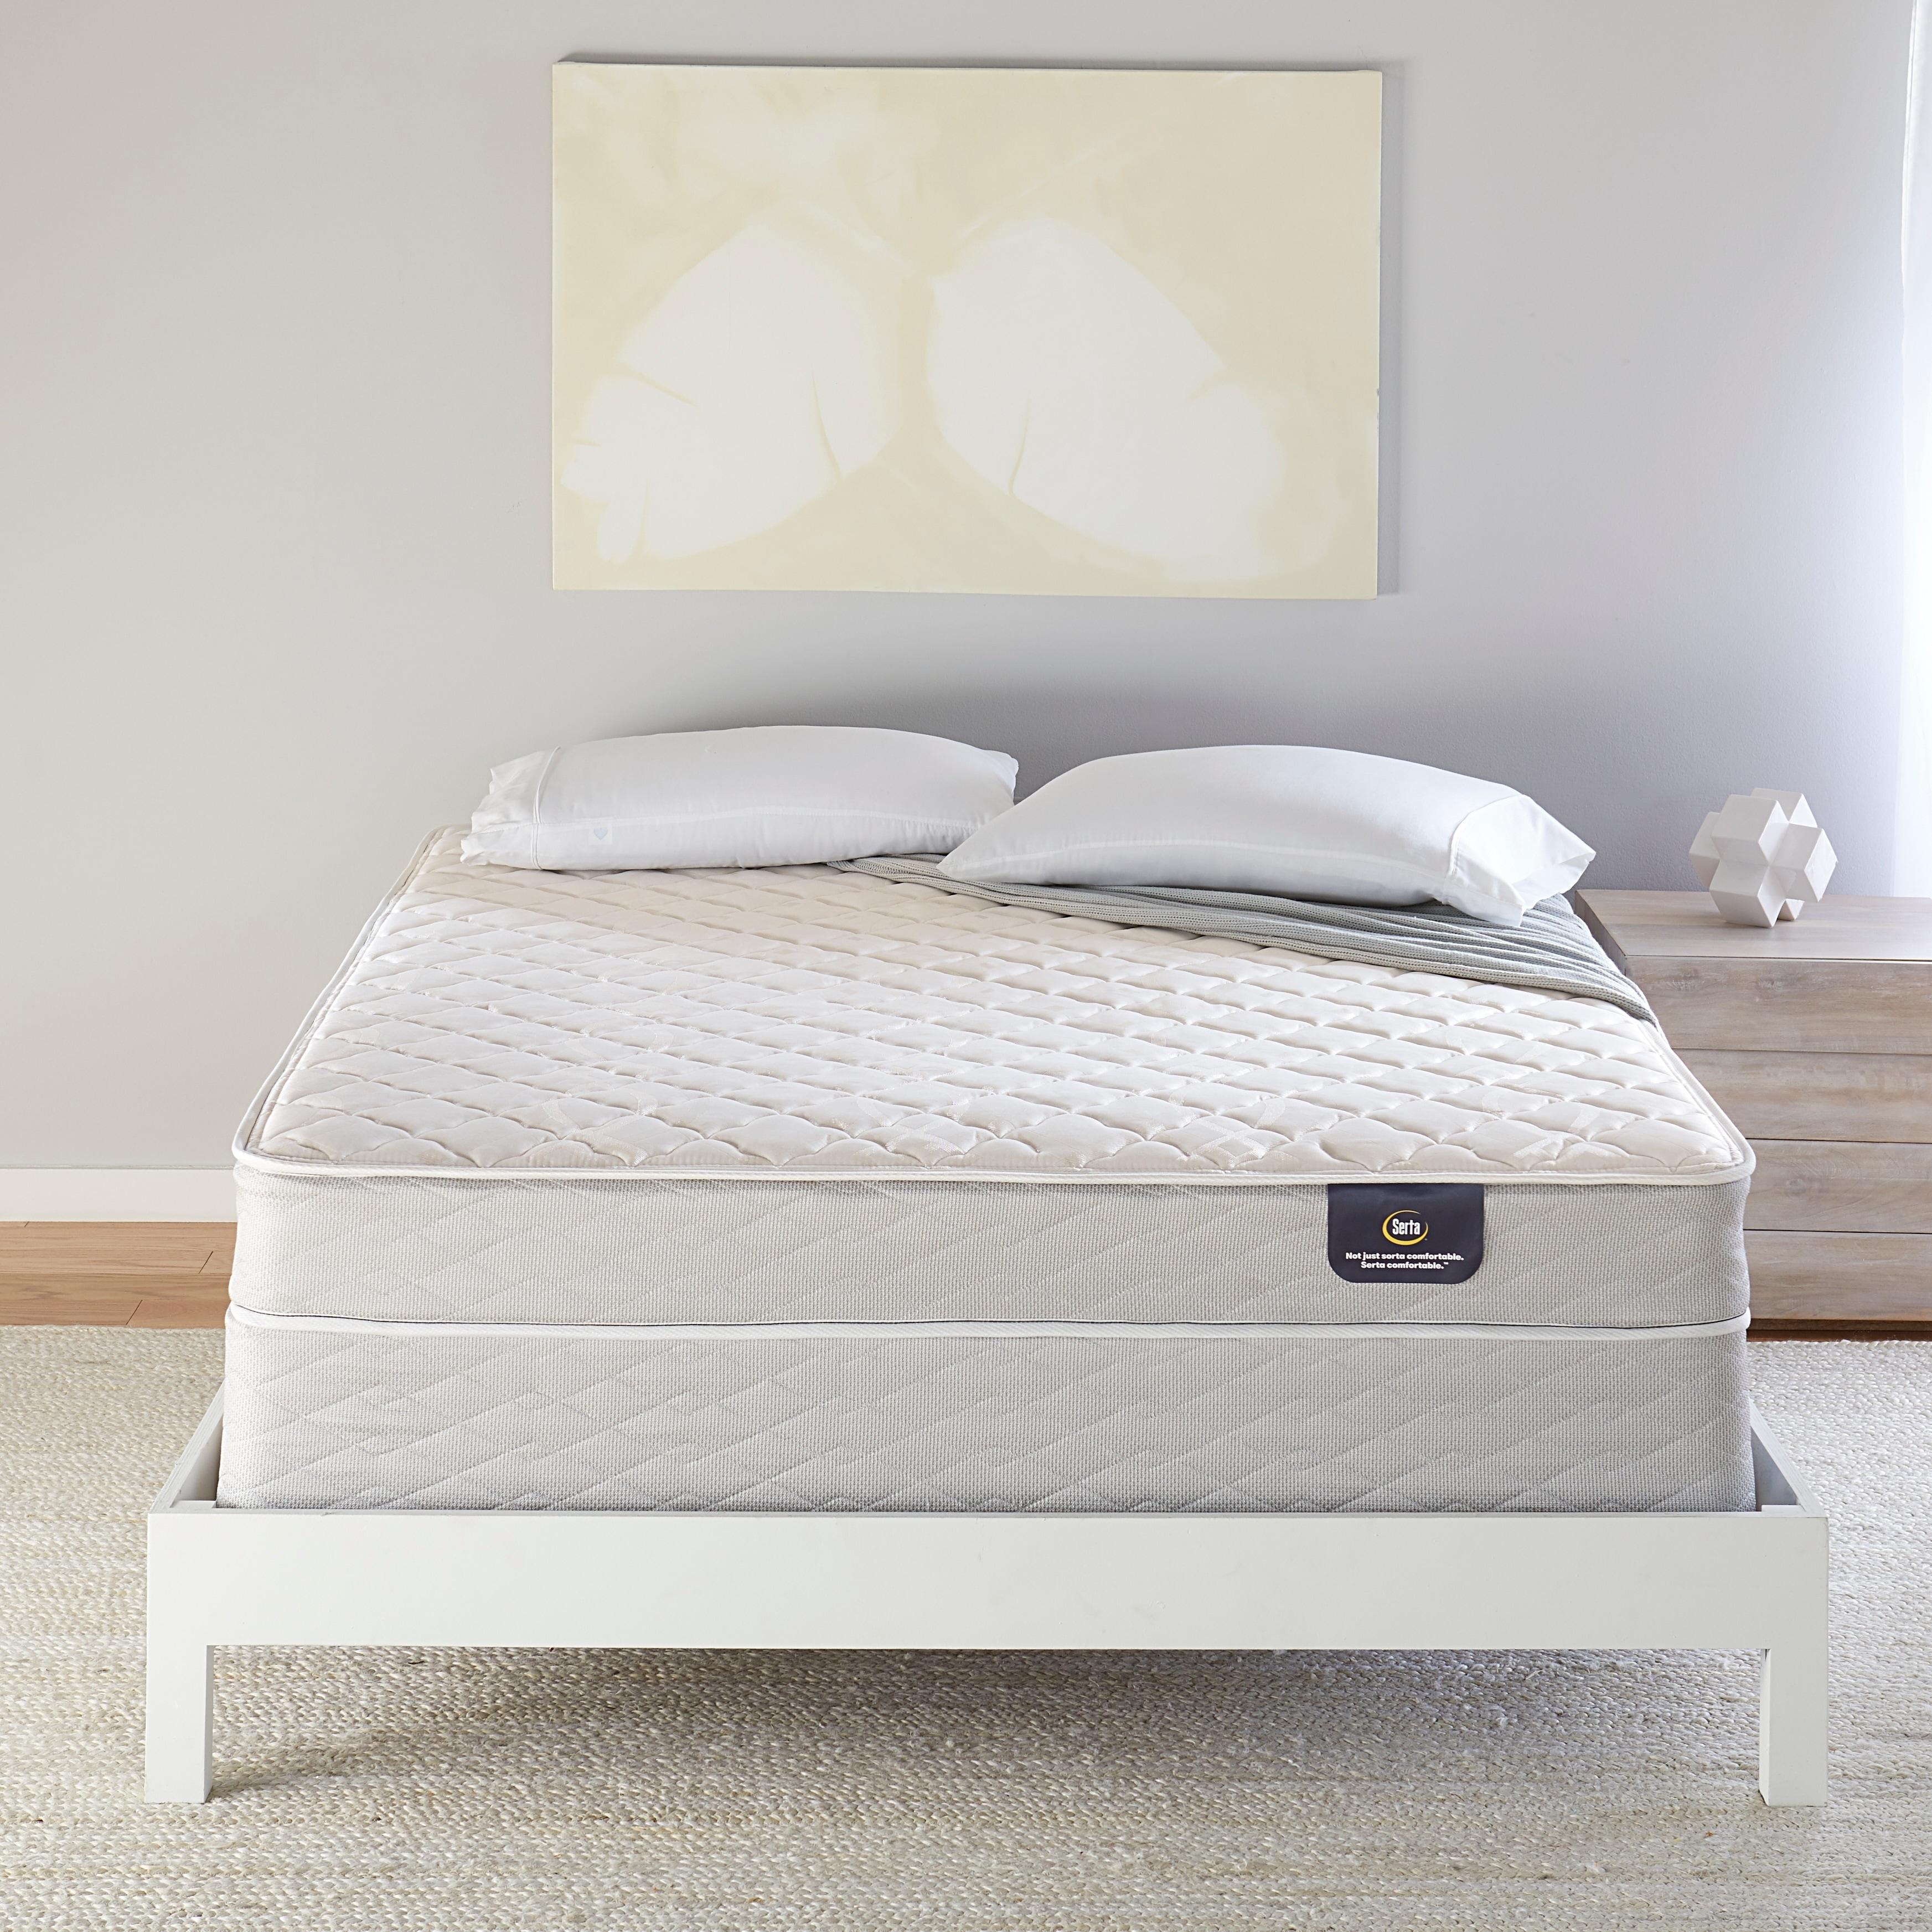 Shop Serta 7 inch Firm Innerspring Full size Mattress Set   Free